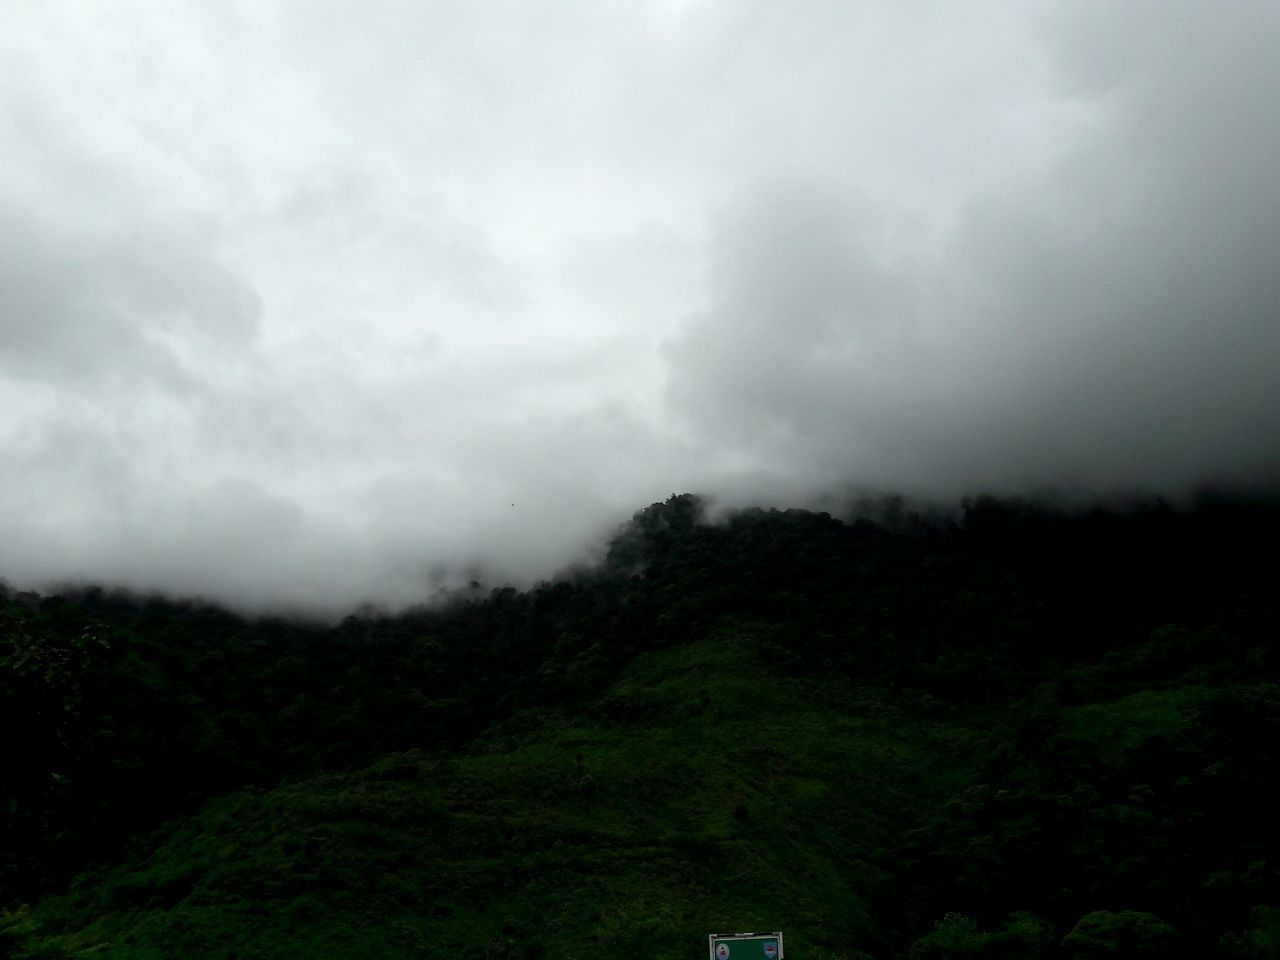 Misty Mountains  Misty Day Arunachal Pradesh Tirap India Beautifulview Green Nature Virgin Hills